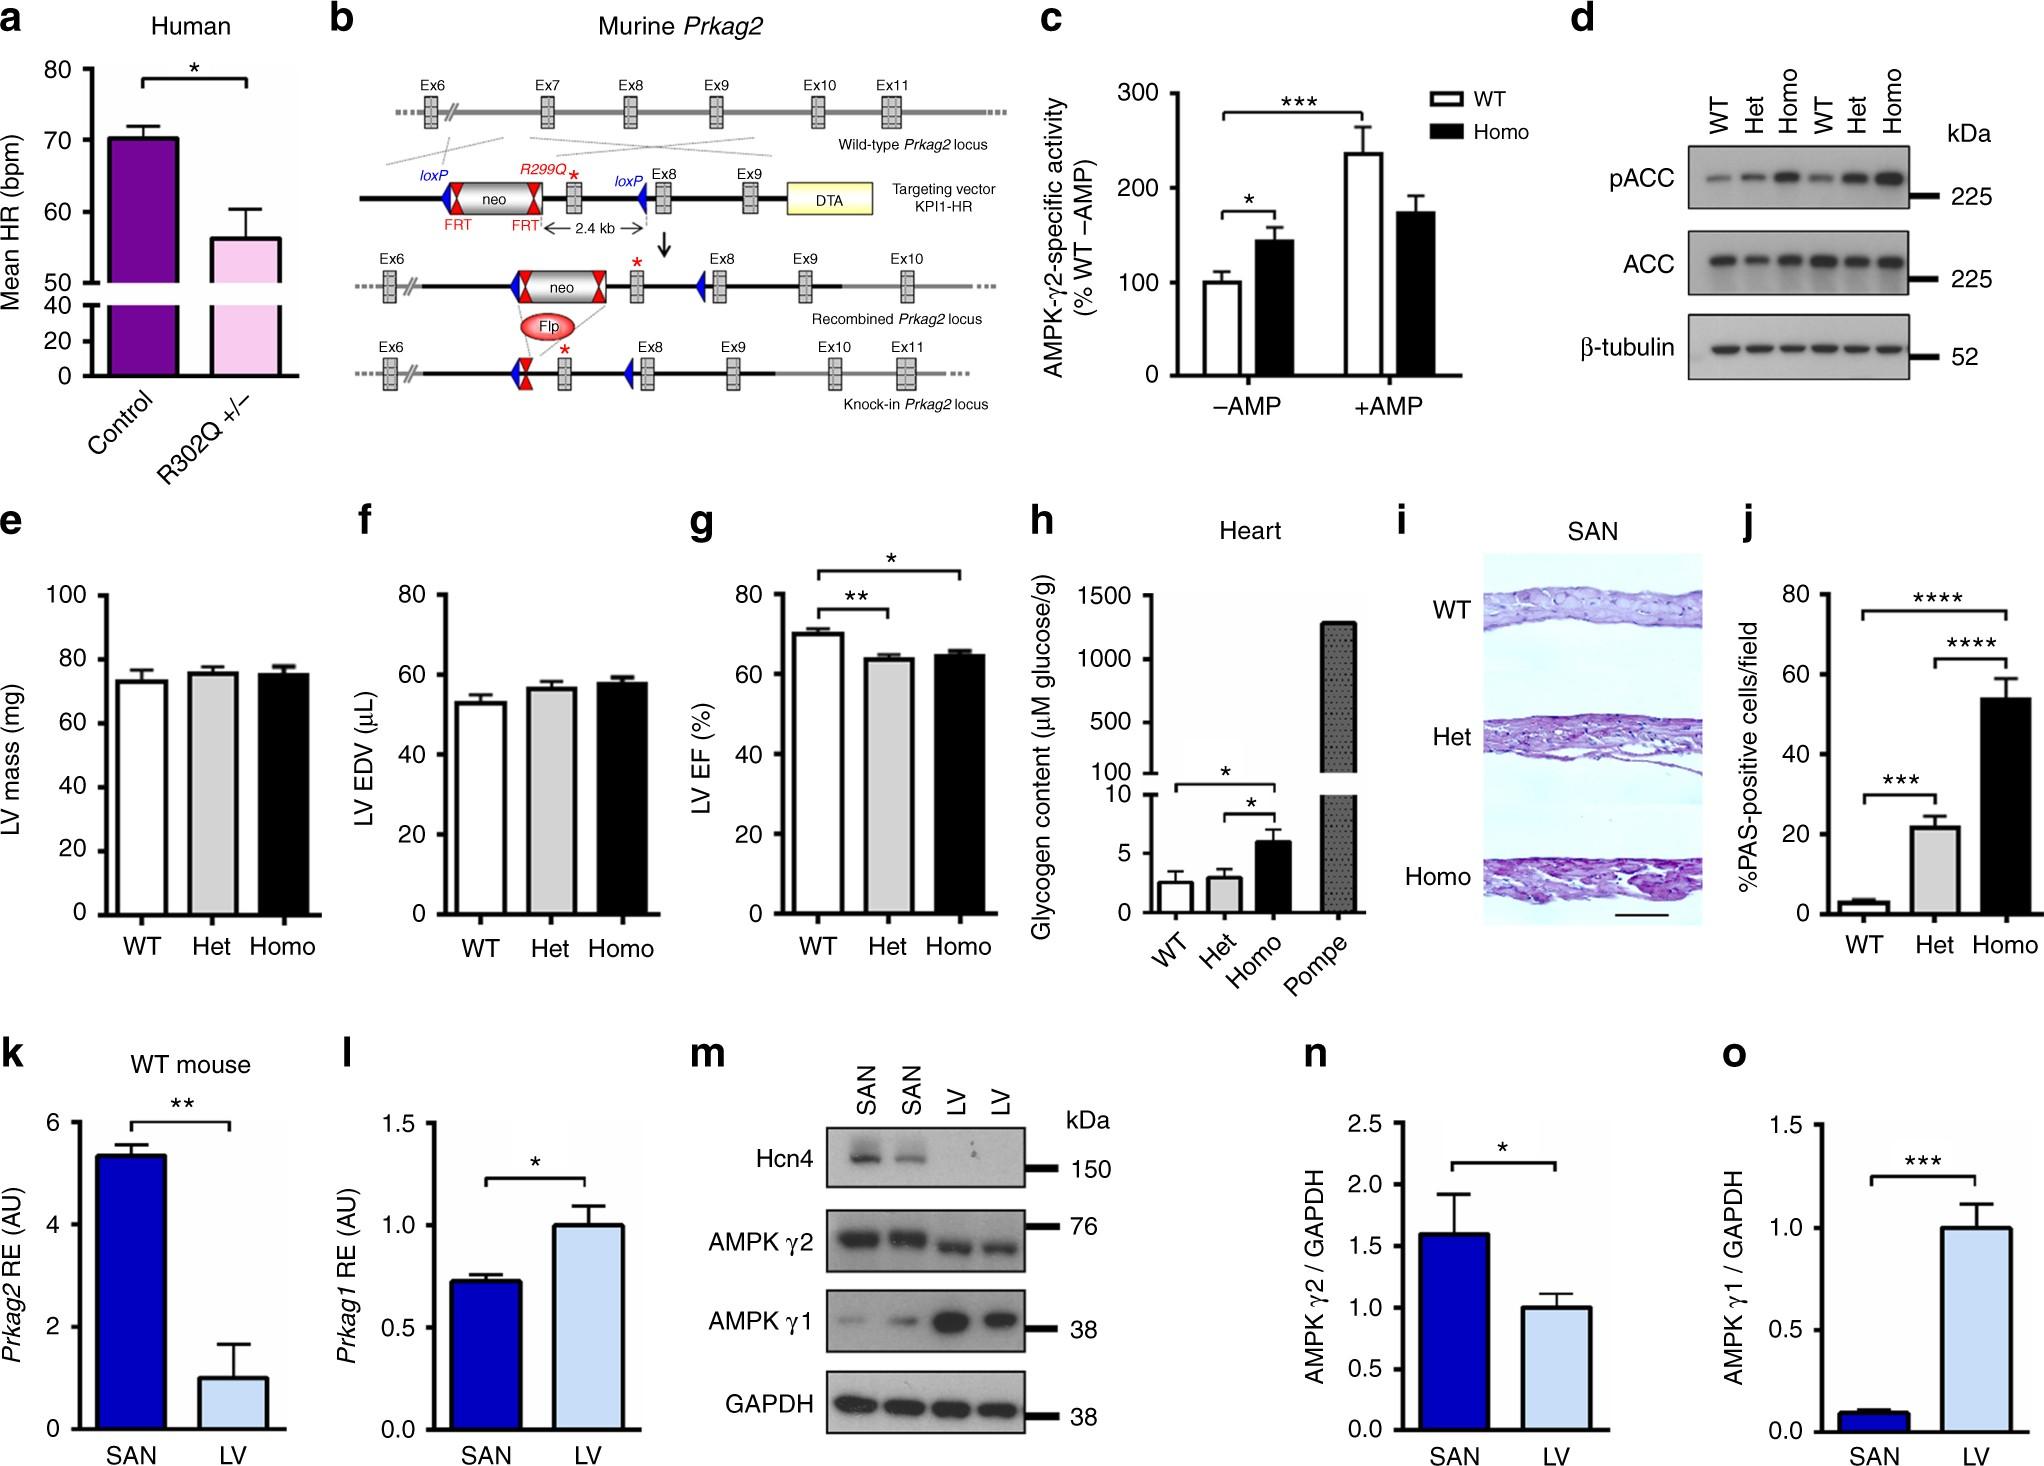 Mammalian γ2 AMPK regulates intrinsic heart rate | Nature